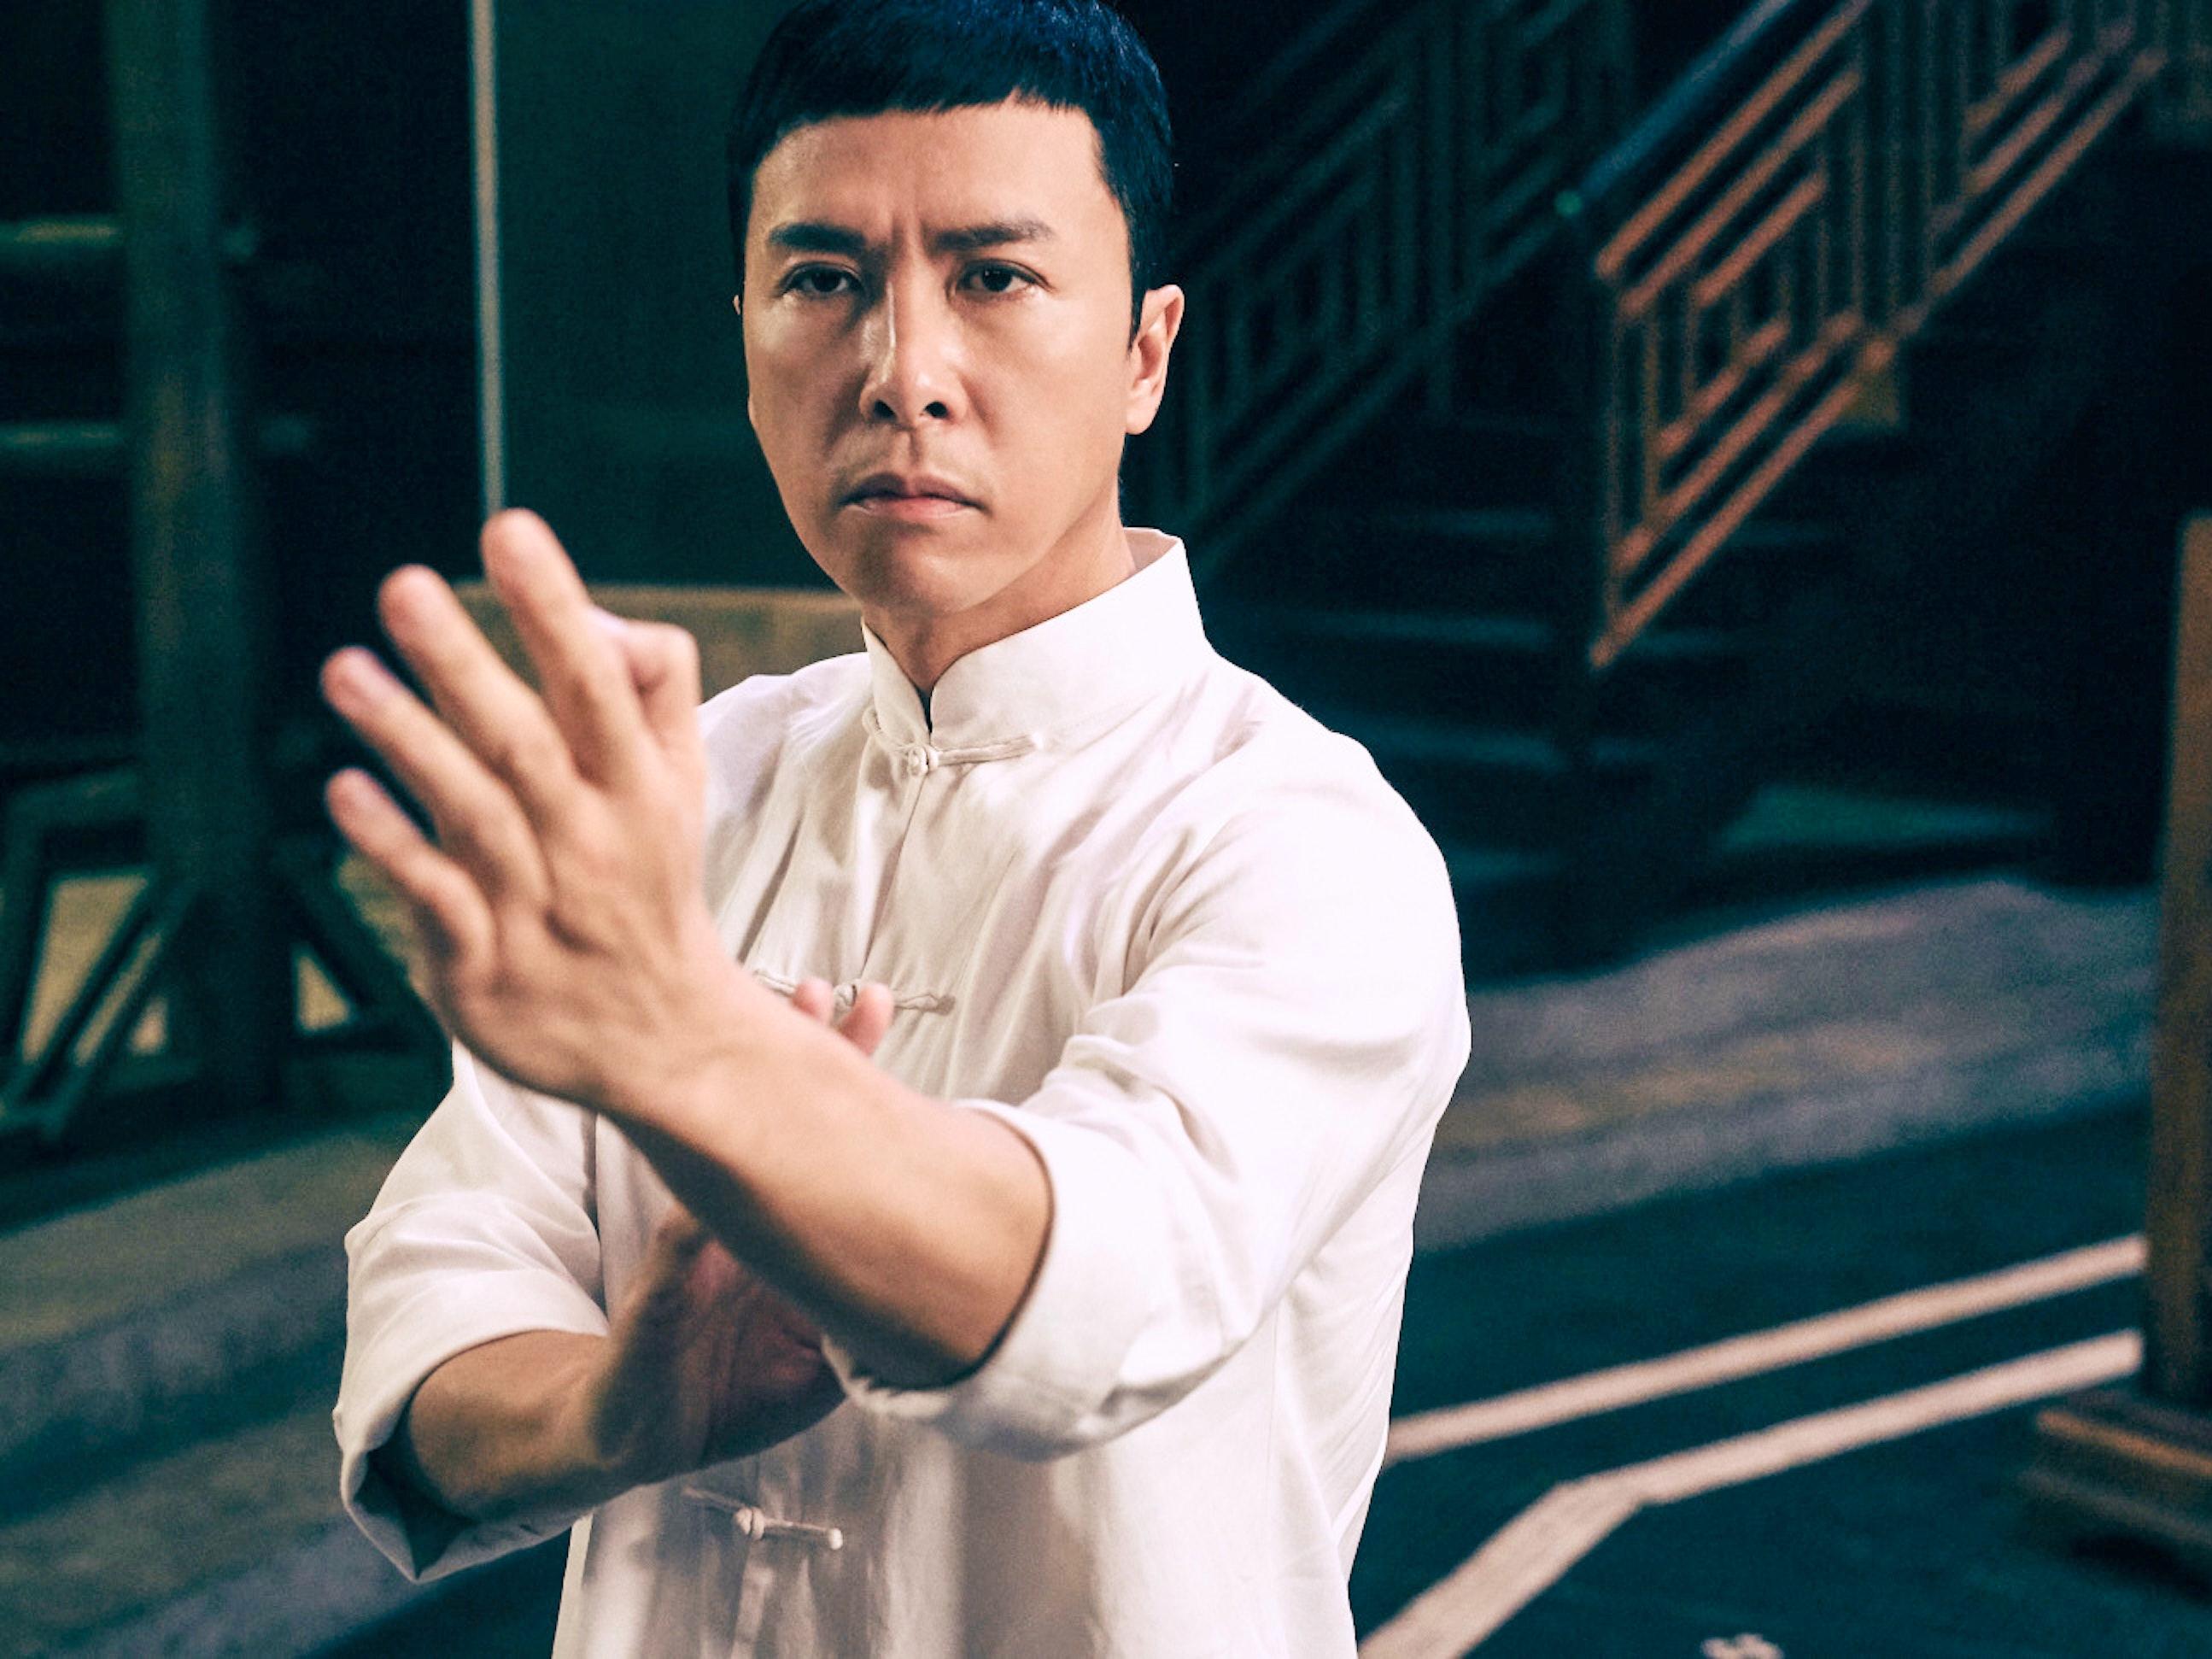 Ip man the grandmaster tony leung - 5 9